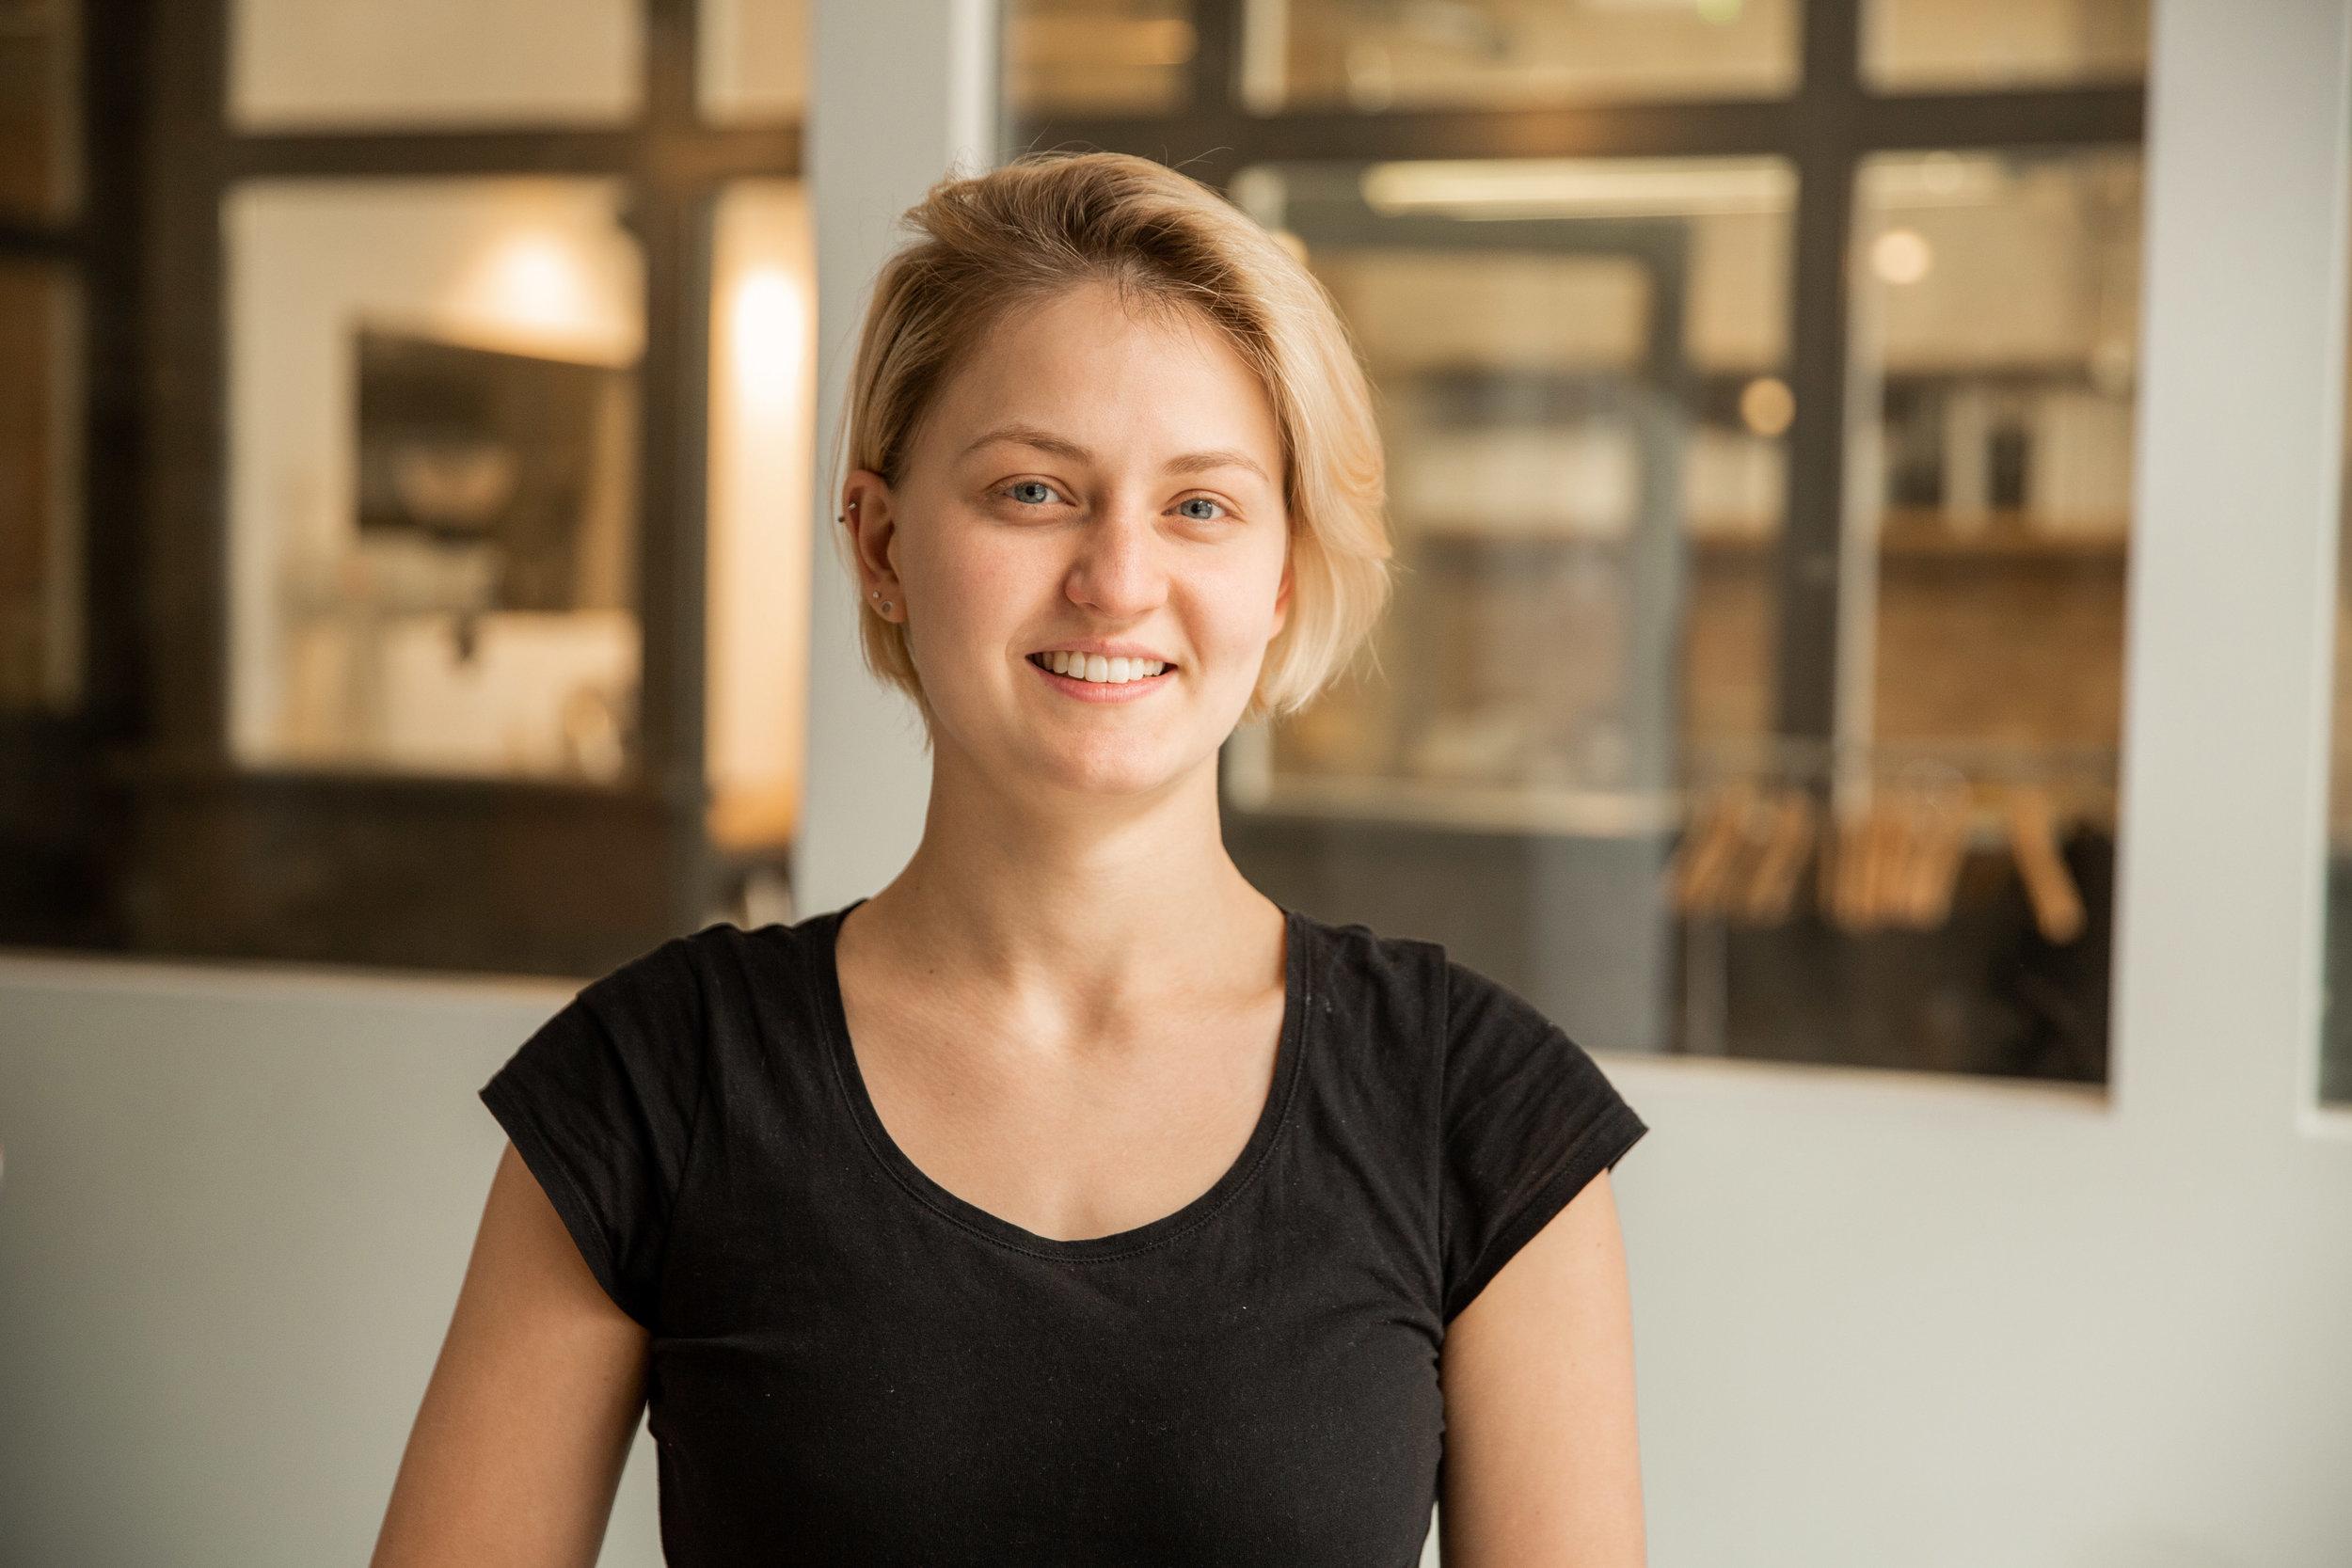 Lydia Smith — Digital Marketing Manager